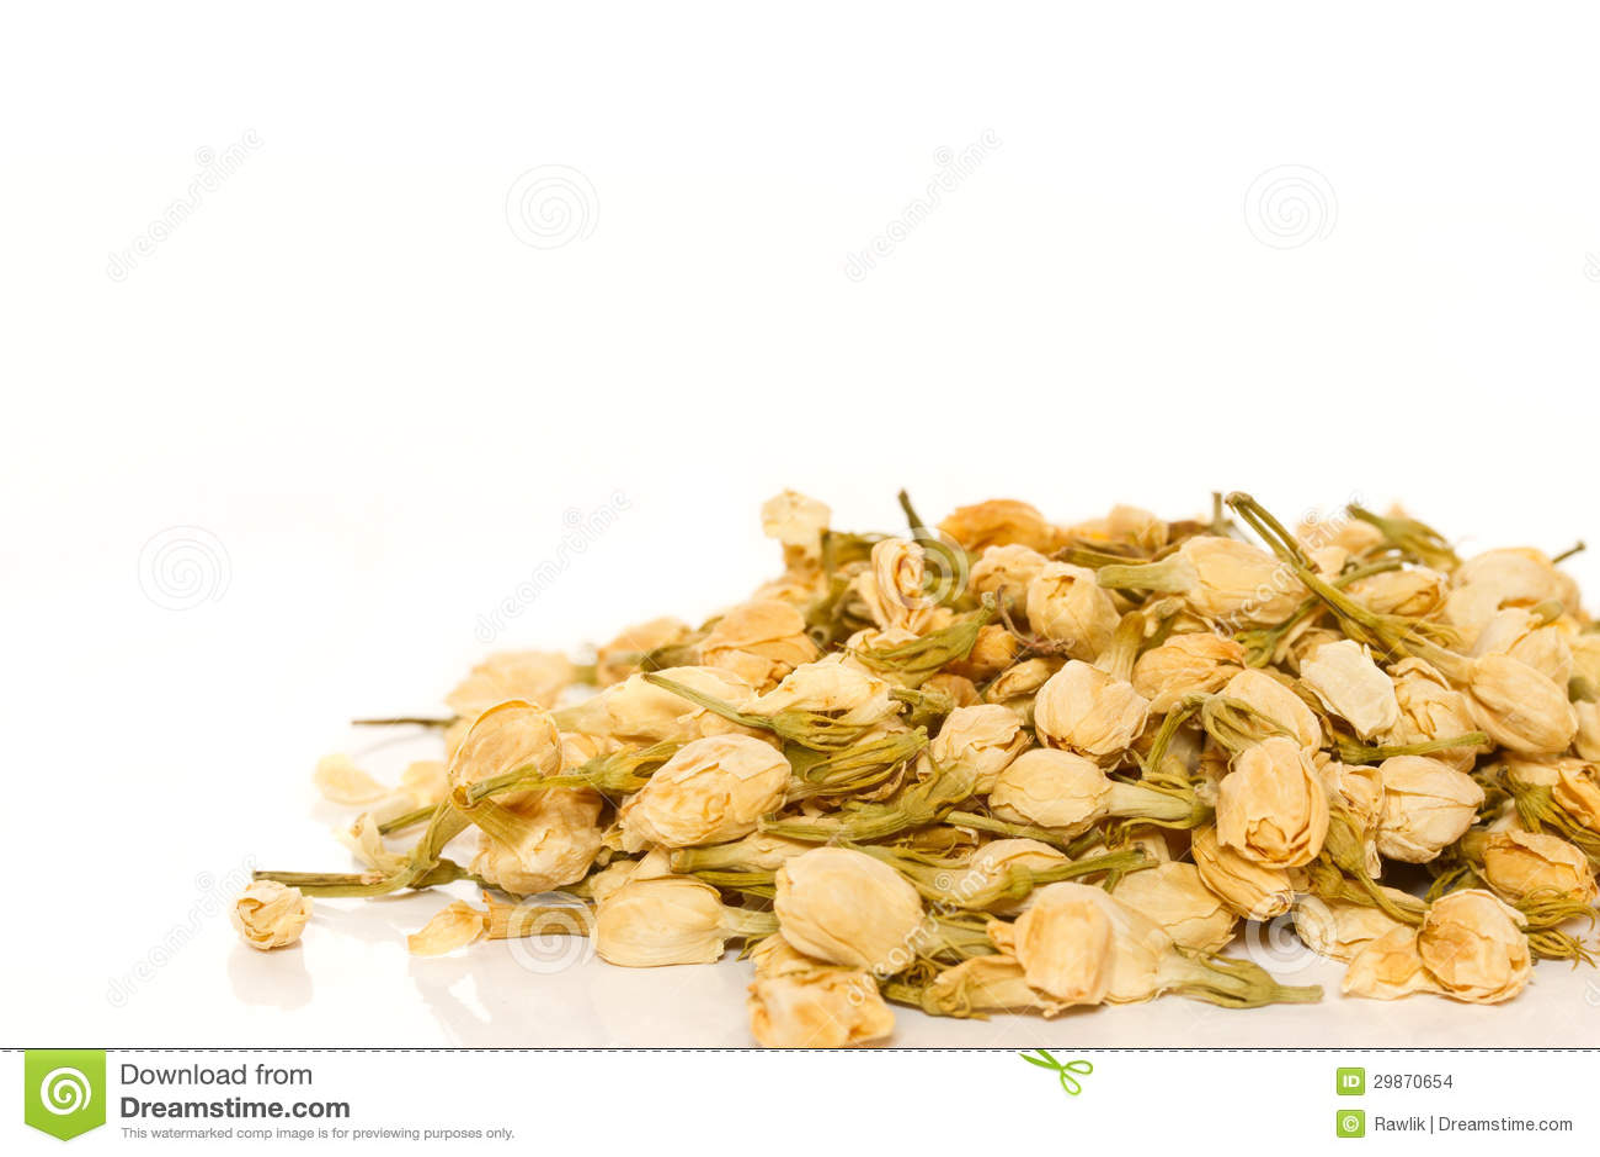 Dry Jasmine Tea Stock Photo Image Of Chinese Flowers 29870654